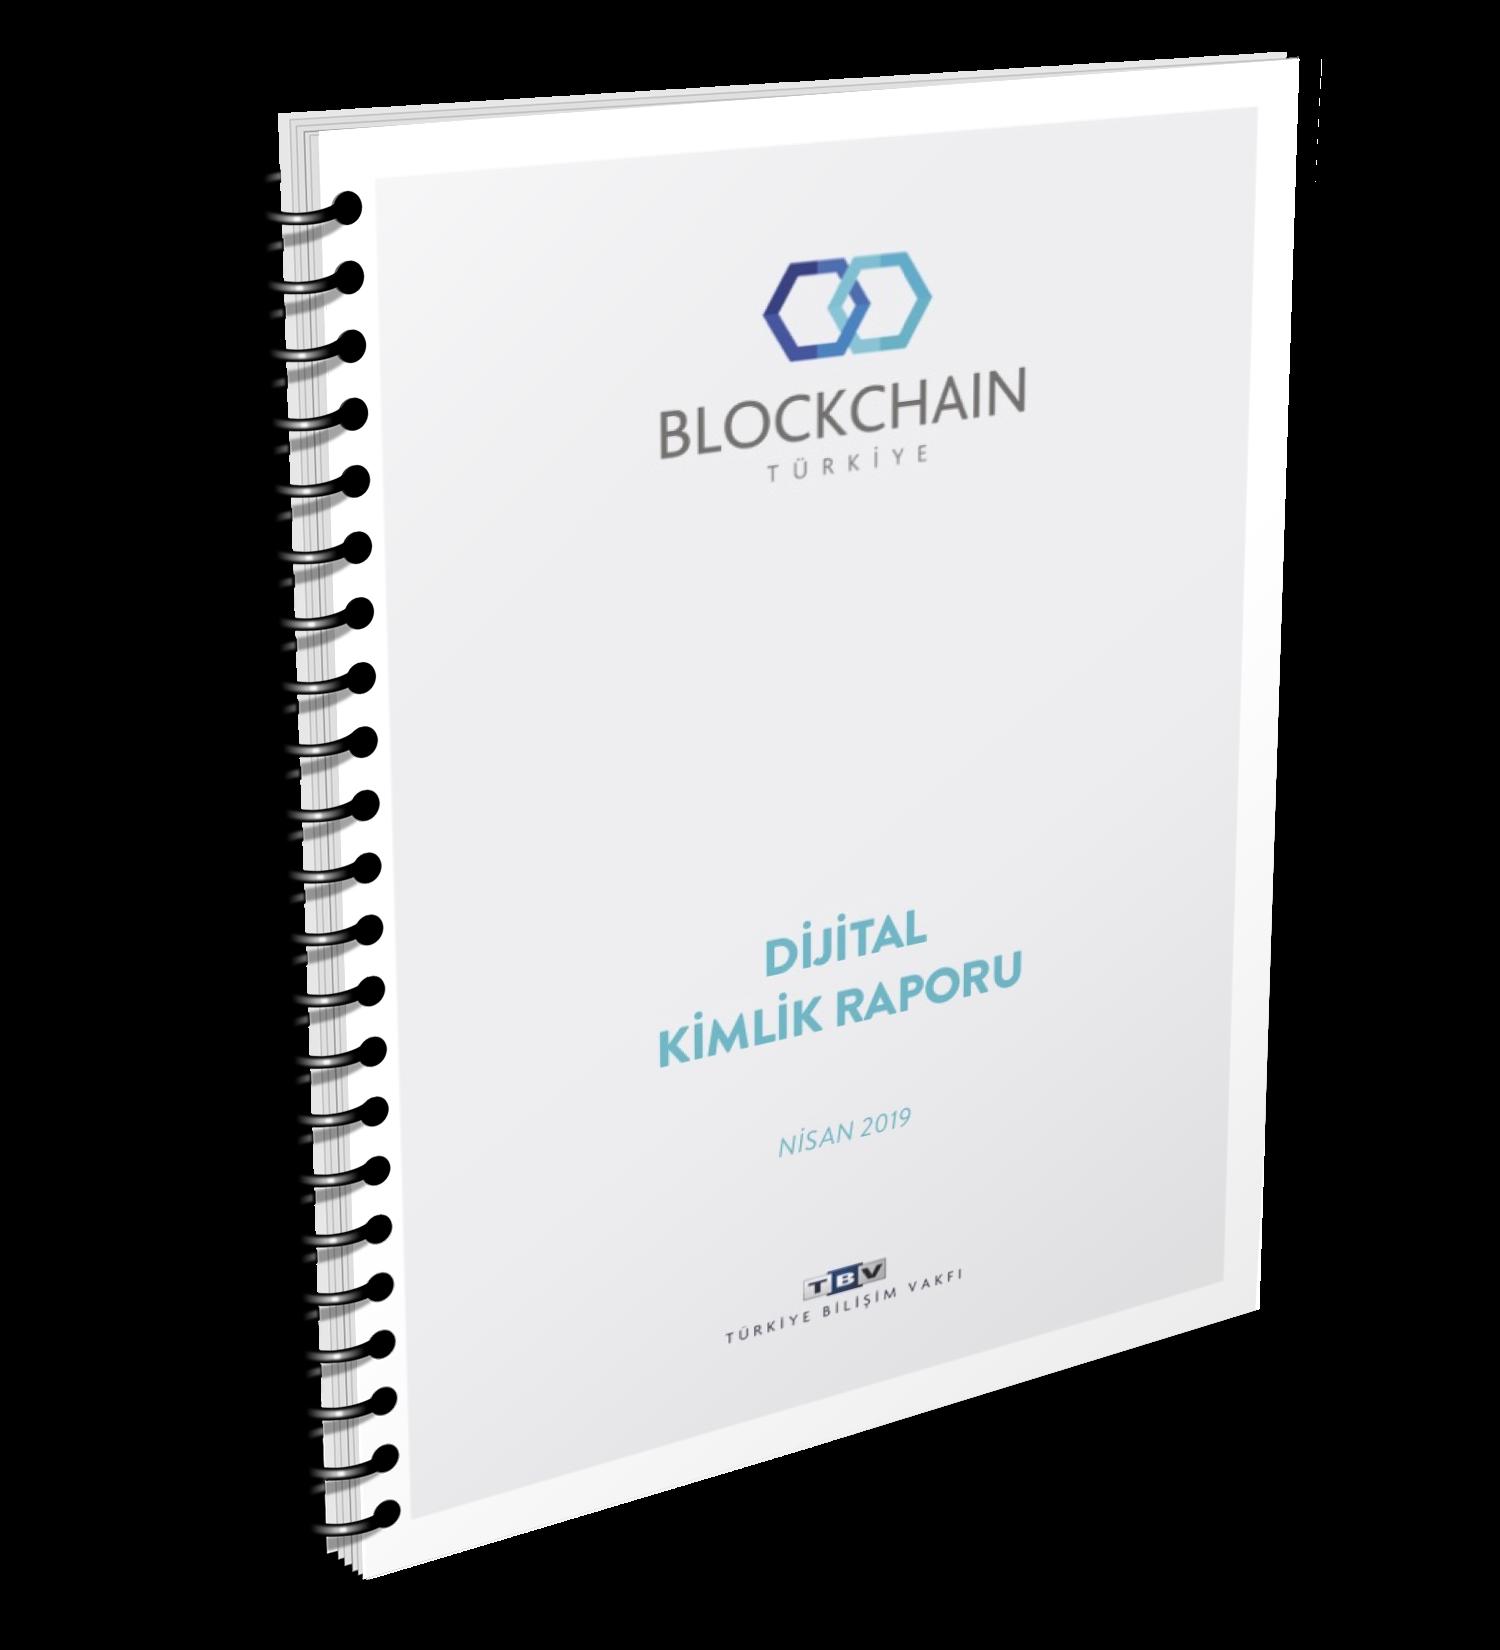 Bctr Calisma Grubu Raporlari Blockchain Turkiye Platformu